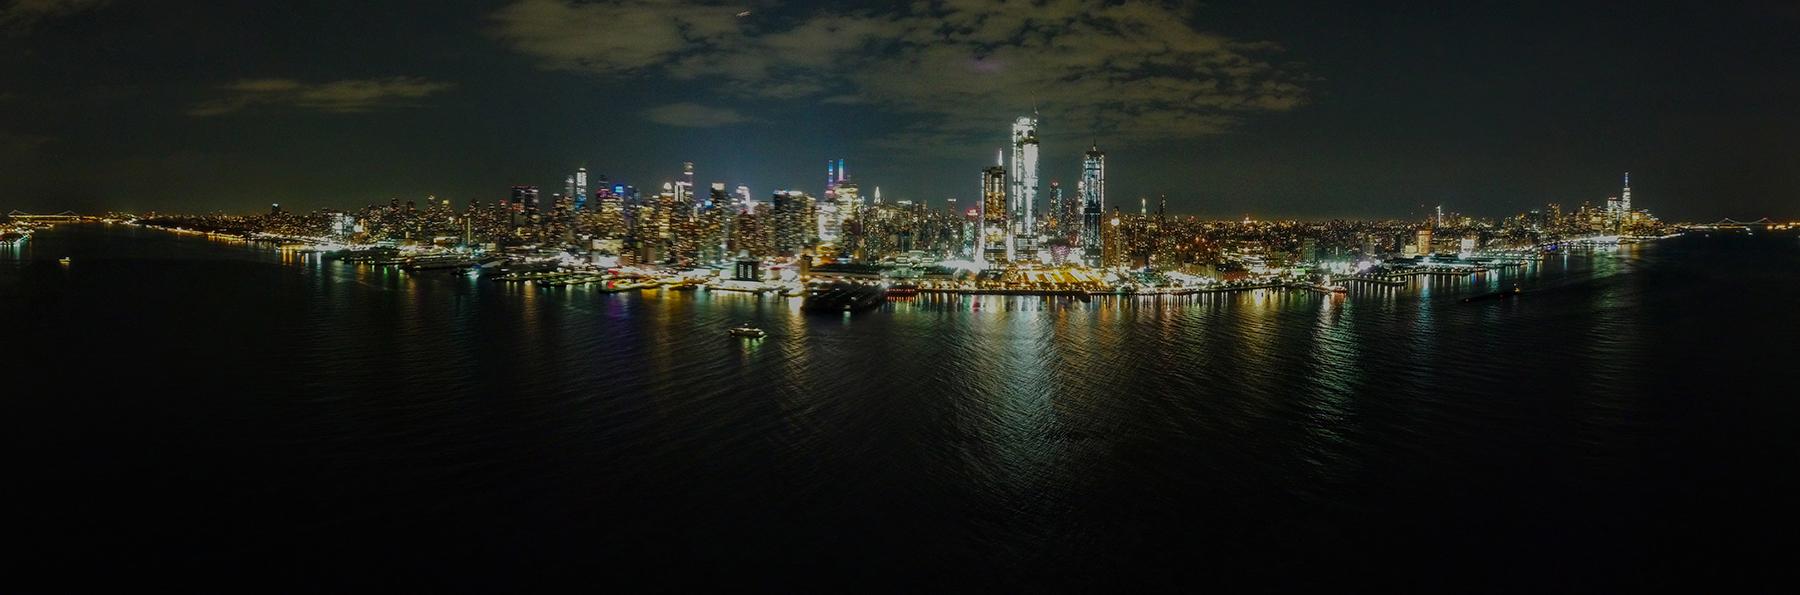 NYC Panorama GWB to VN Bridge